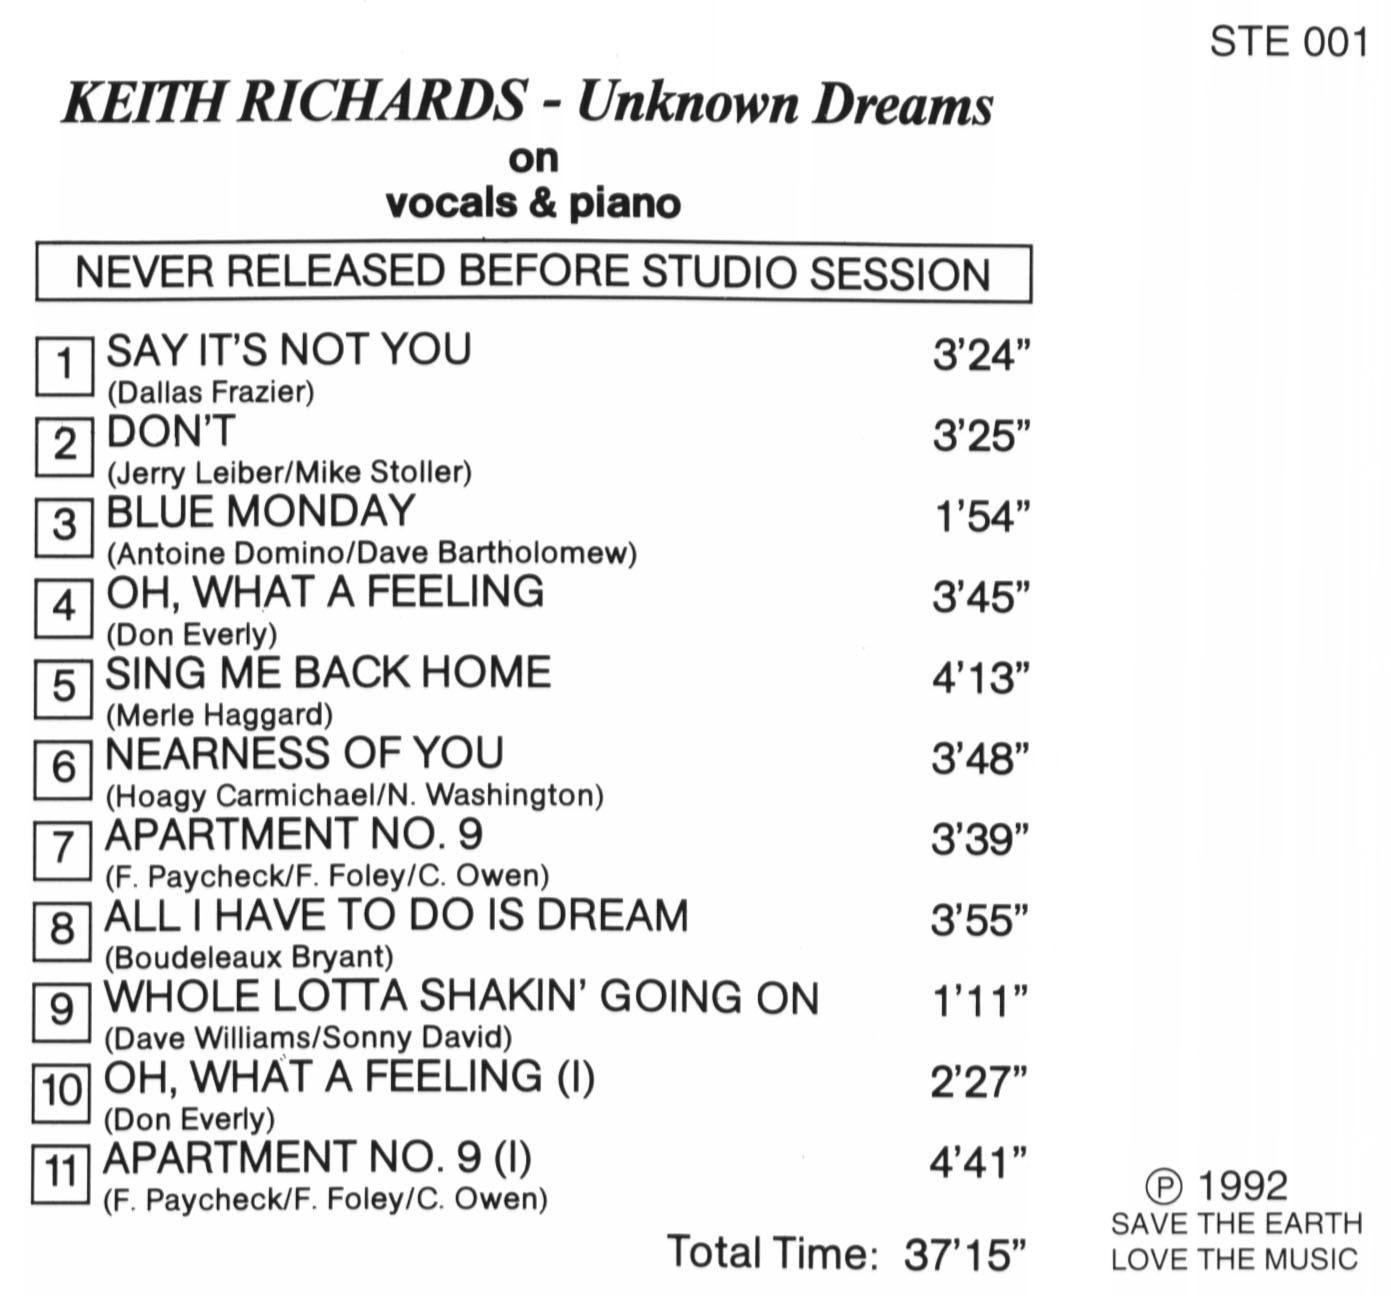 KeithRichards1981-05-25_28UnknownDreams2.jpg